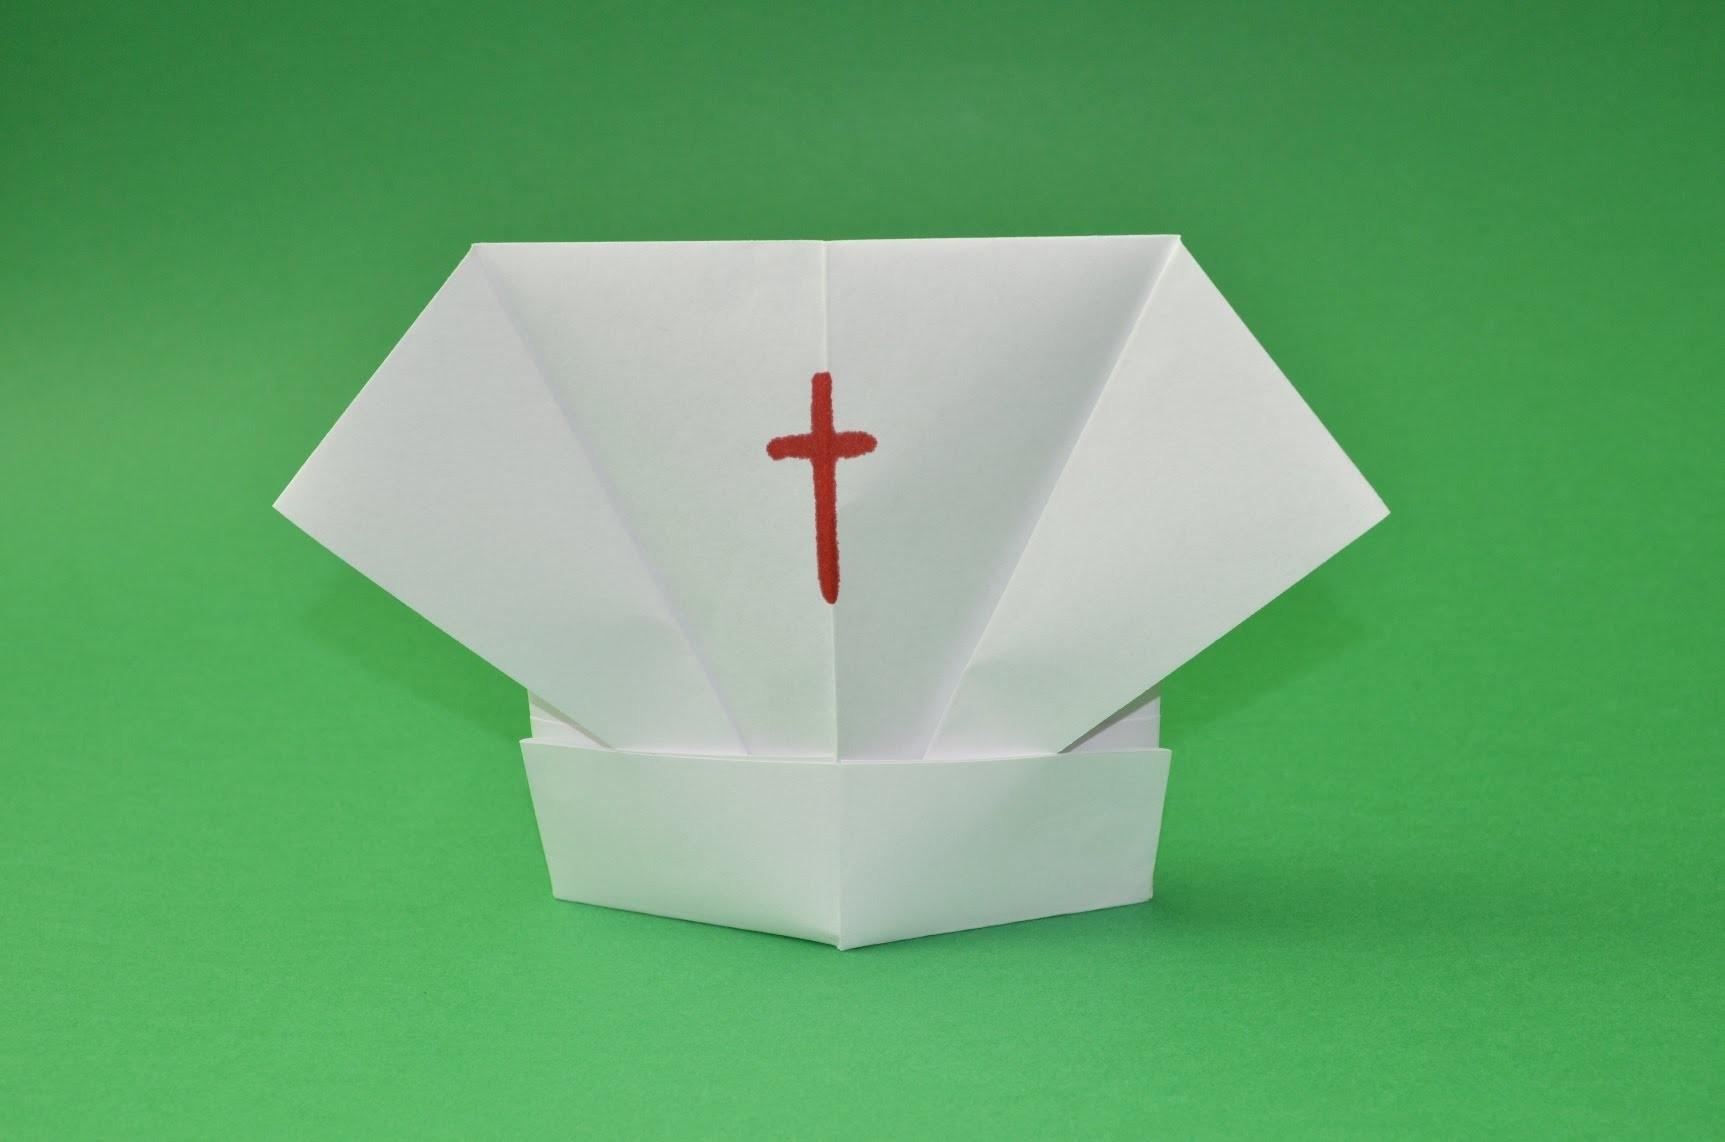 Como hacer un gorro de enfermera de papel facil